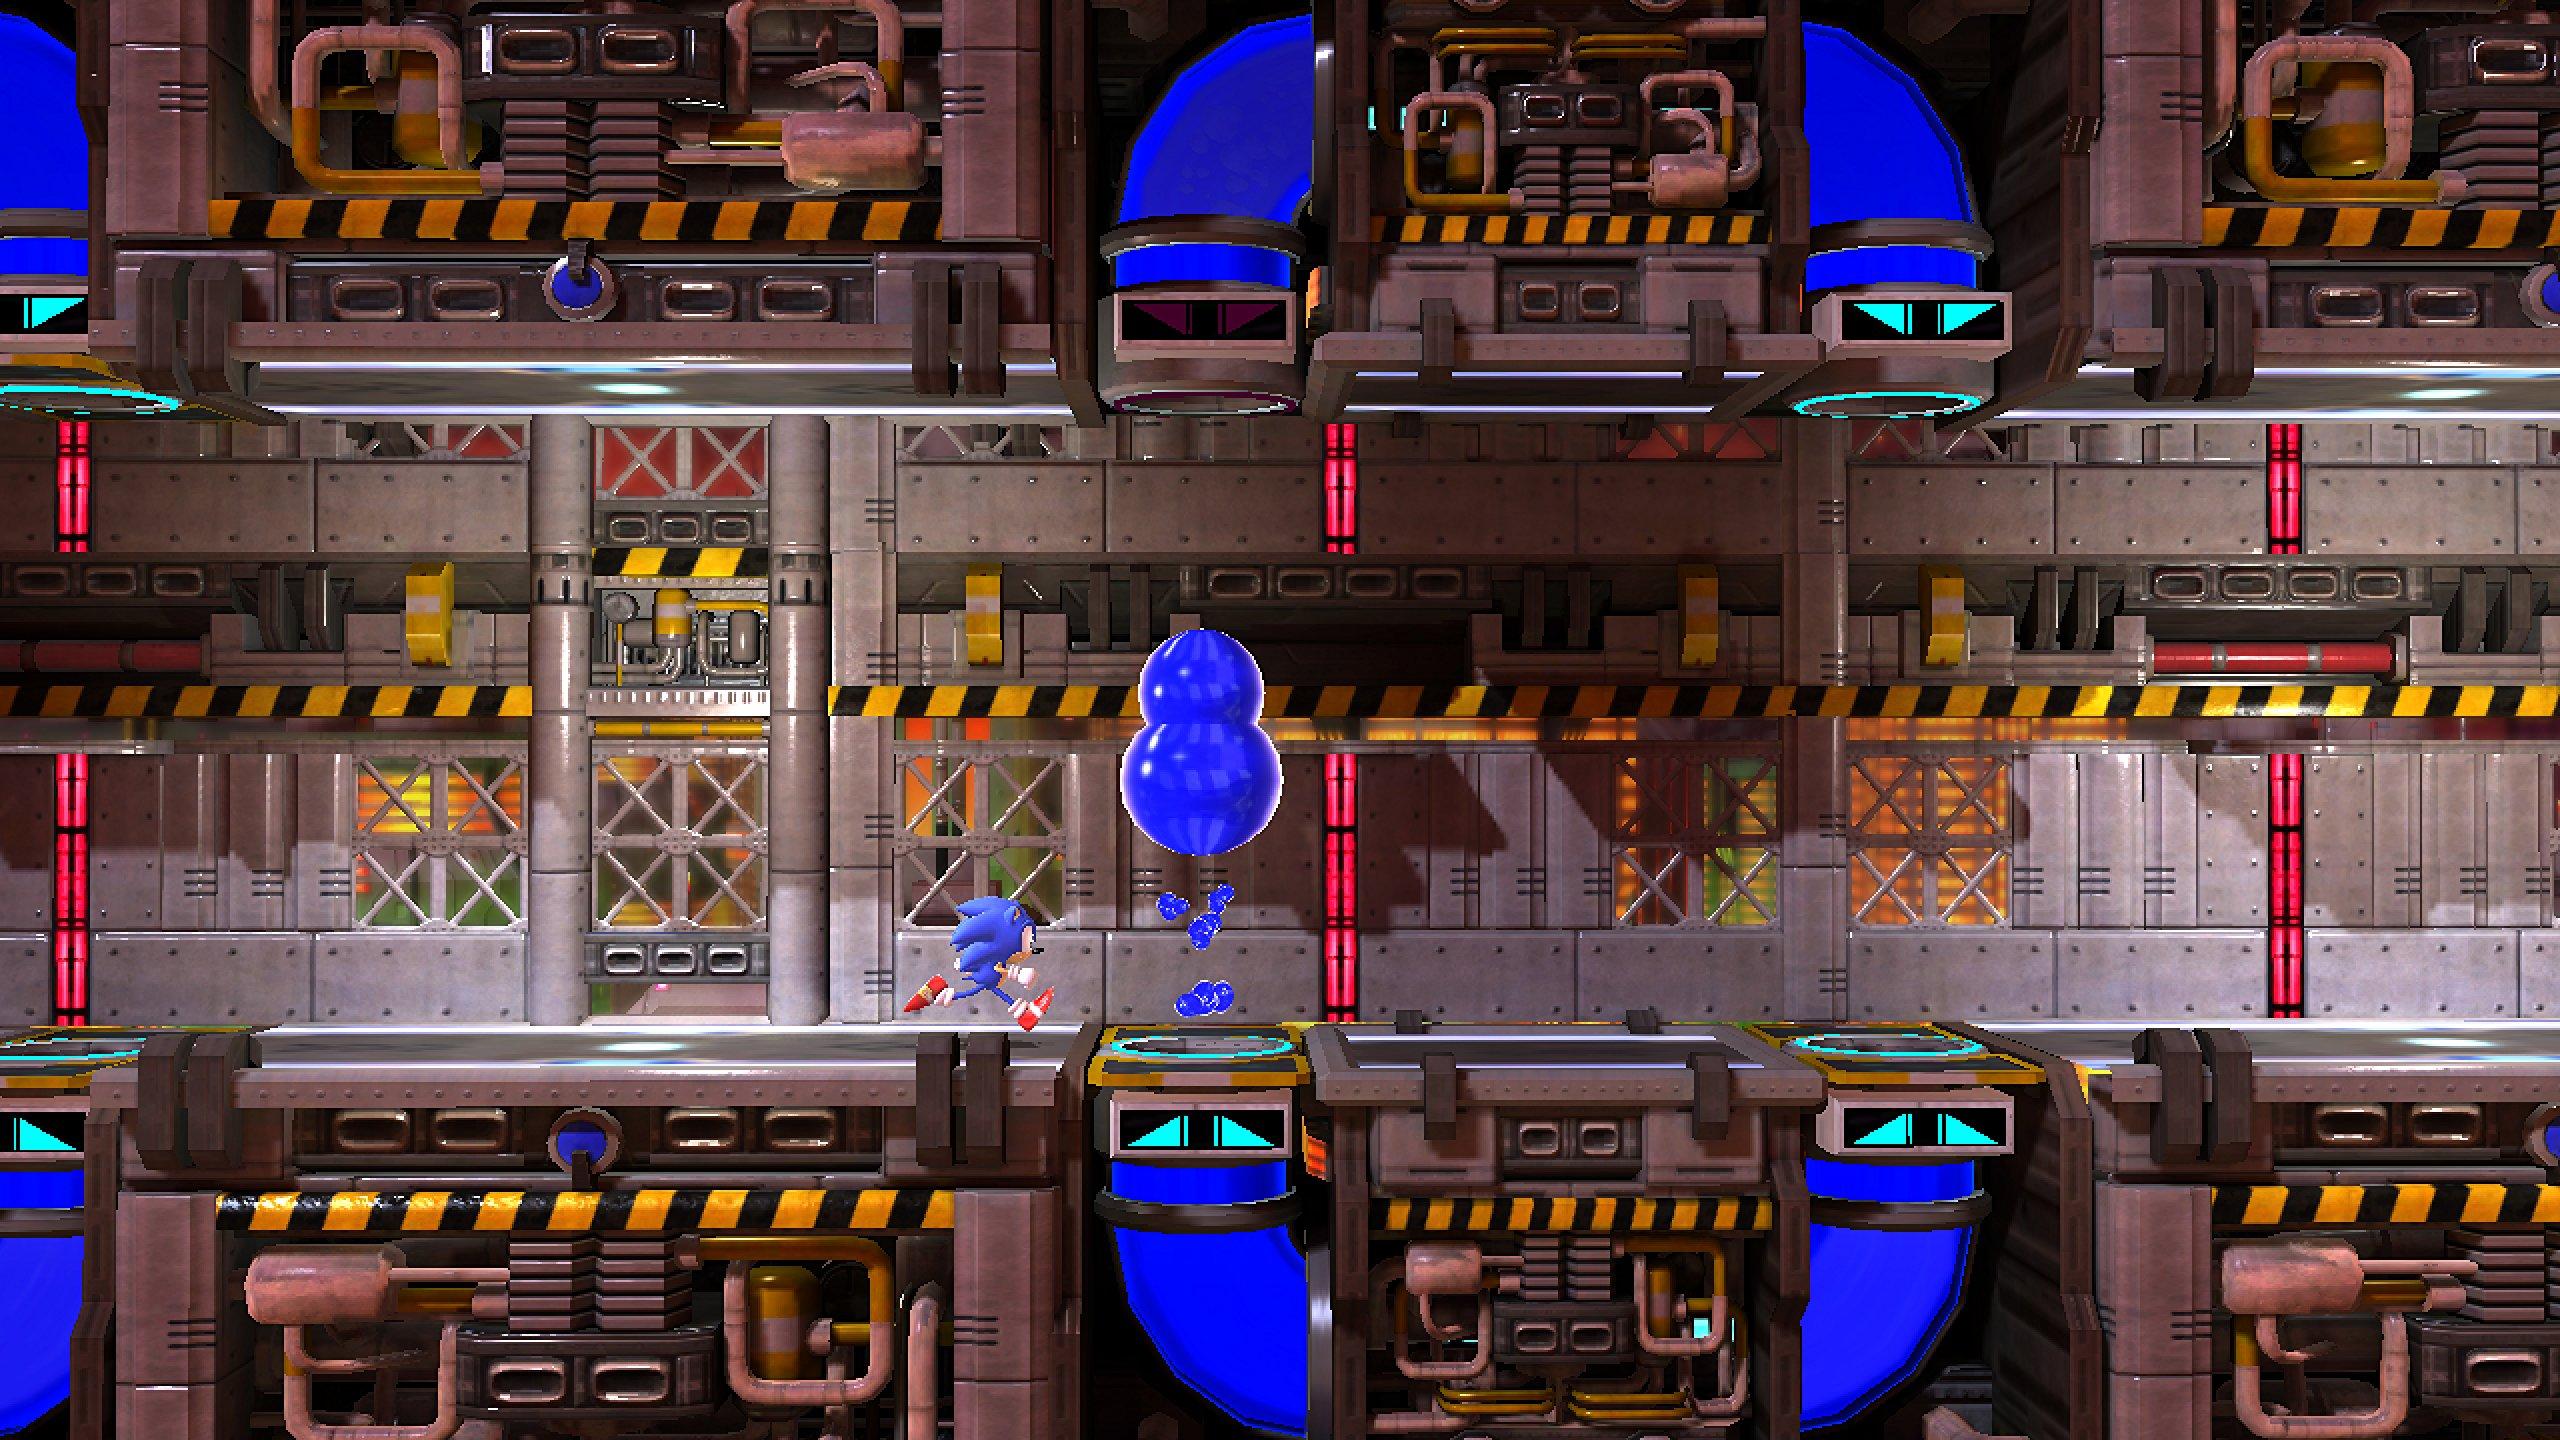 Sonic Generations - Nintendo 3DS by Sega (Image #17)